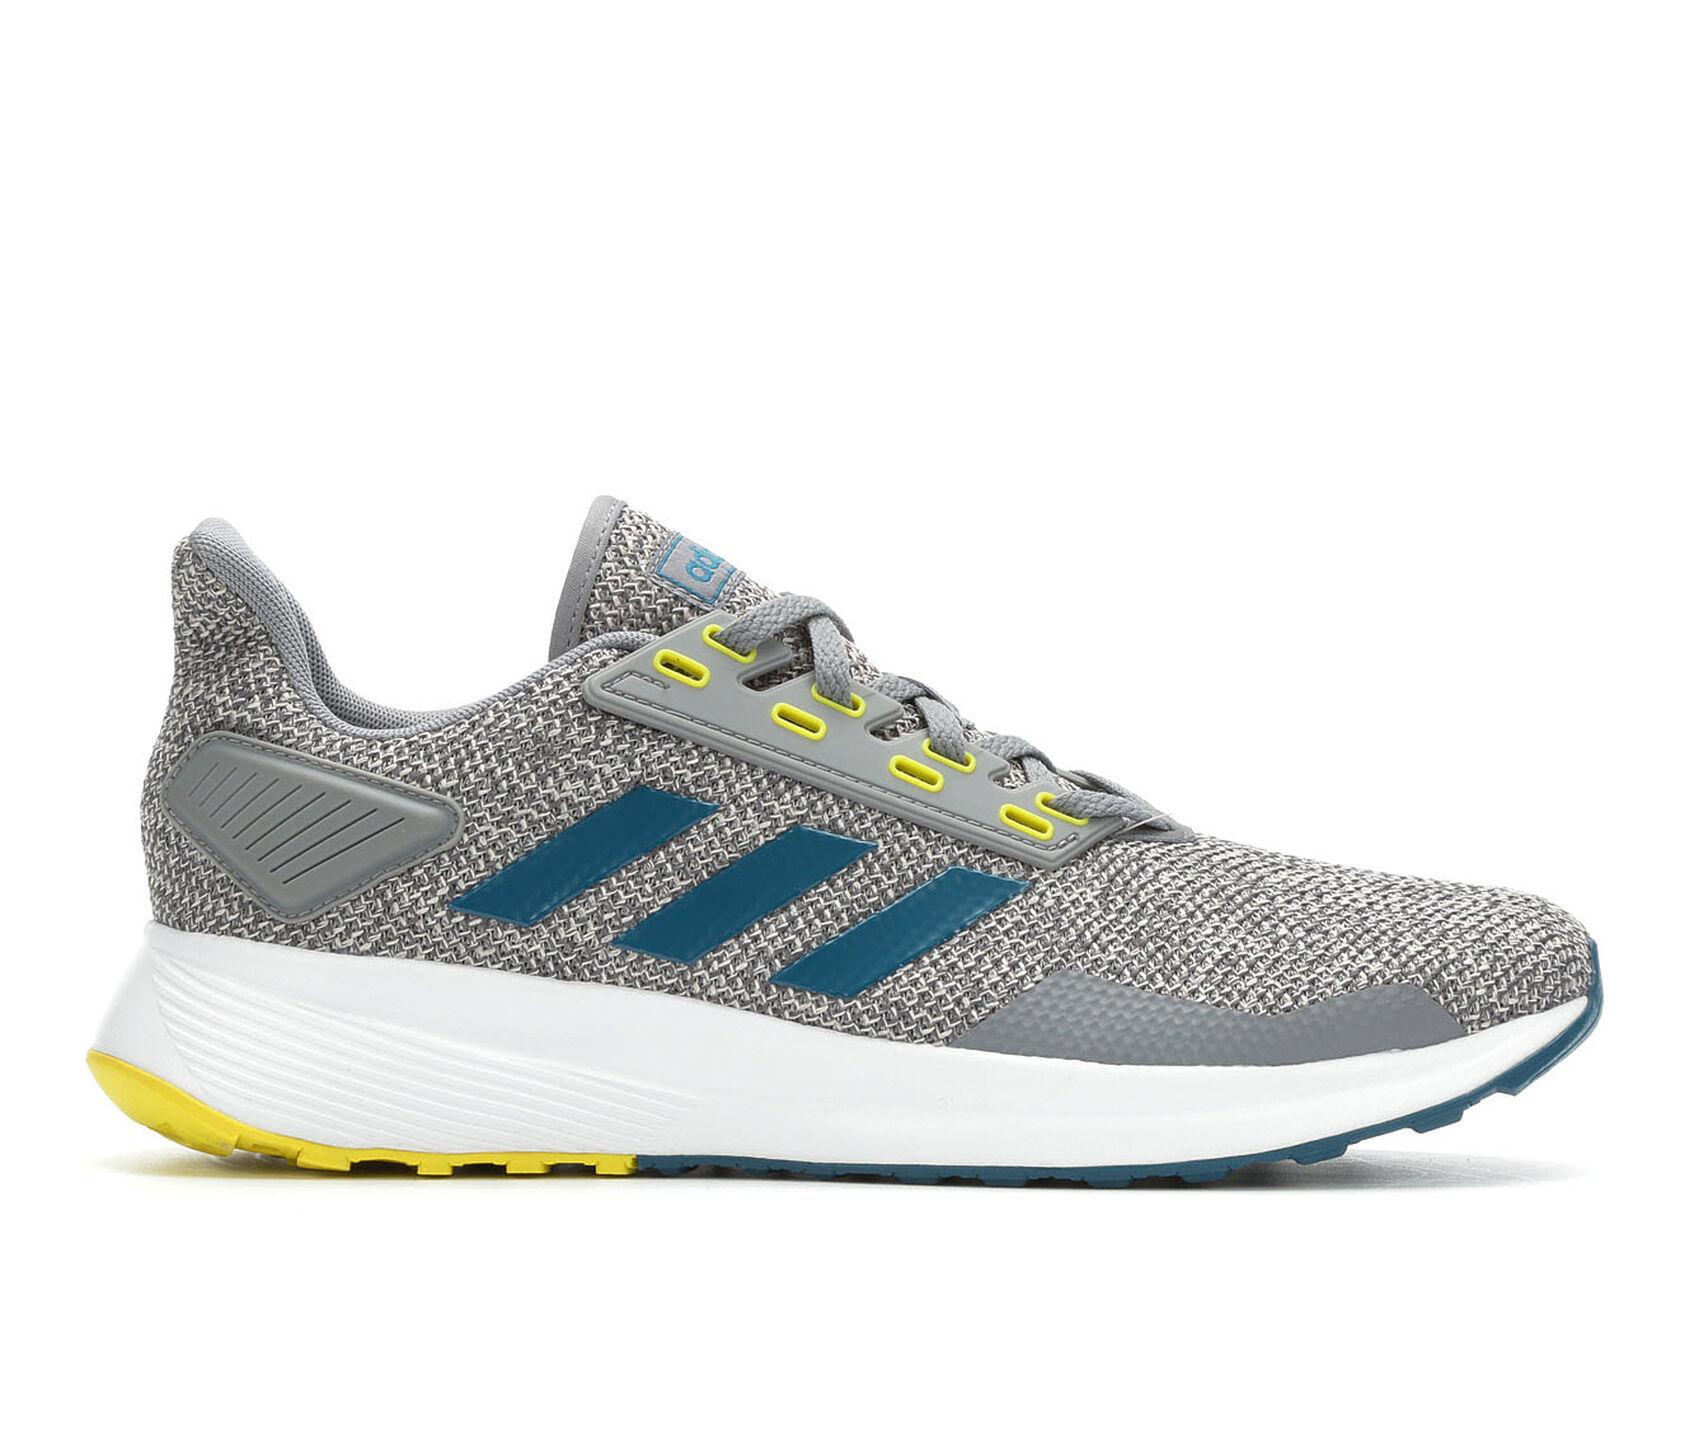 purchase cheap e3f48 7a9f1 ... Adidas Duramo 9 Knit Running Shoes. Previous